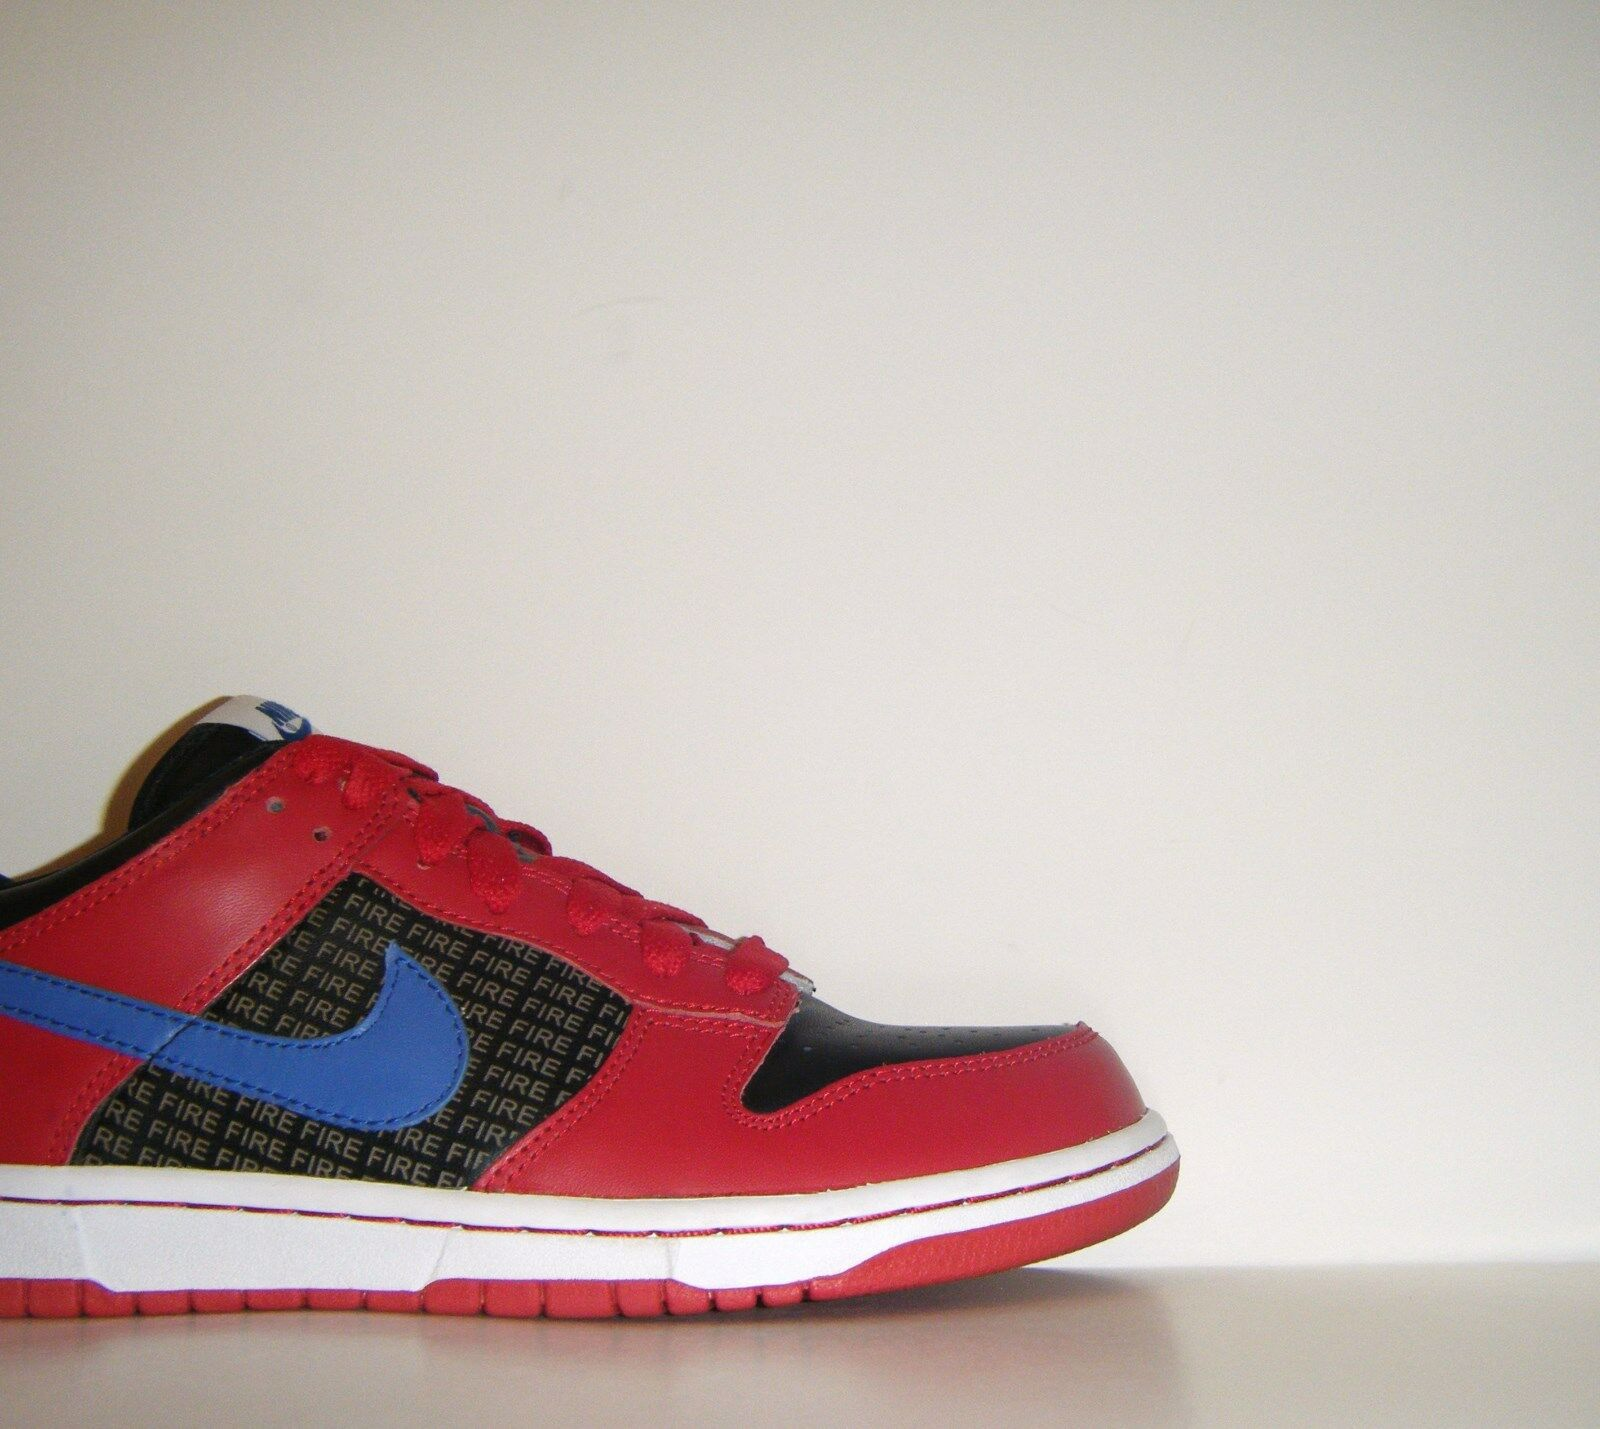 2008 Nike Nike Nike Dunk Low Fire & Ice ID Promo Sample QS Sz. 9 USA Red White bluee SB Pro fc0eaf